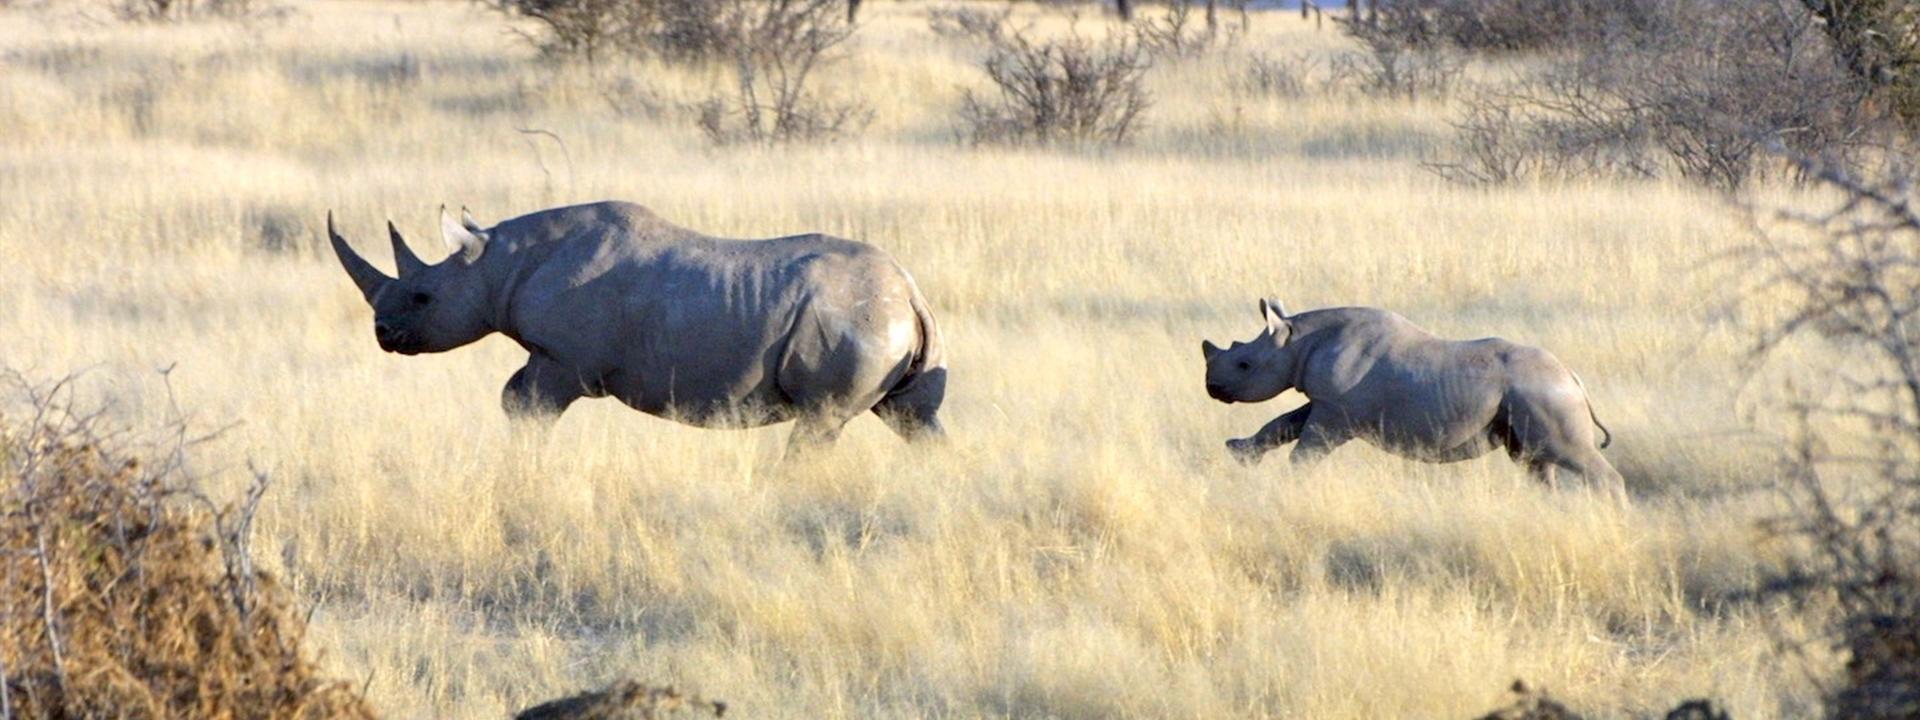 Urlaubs Ranger Safari Namibia Banner